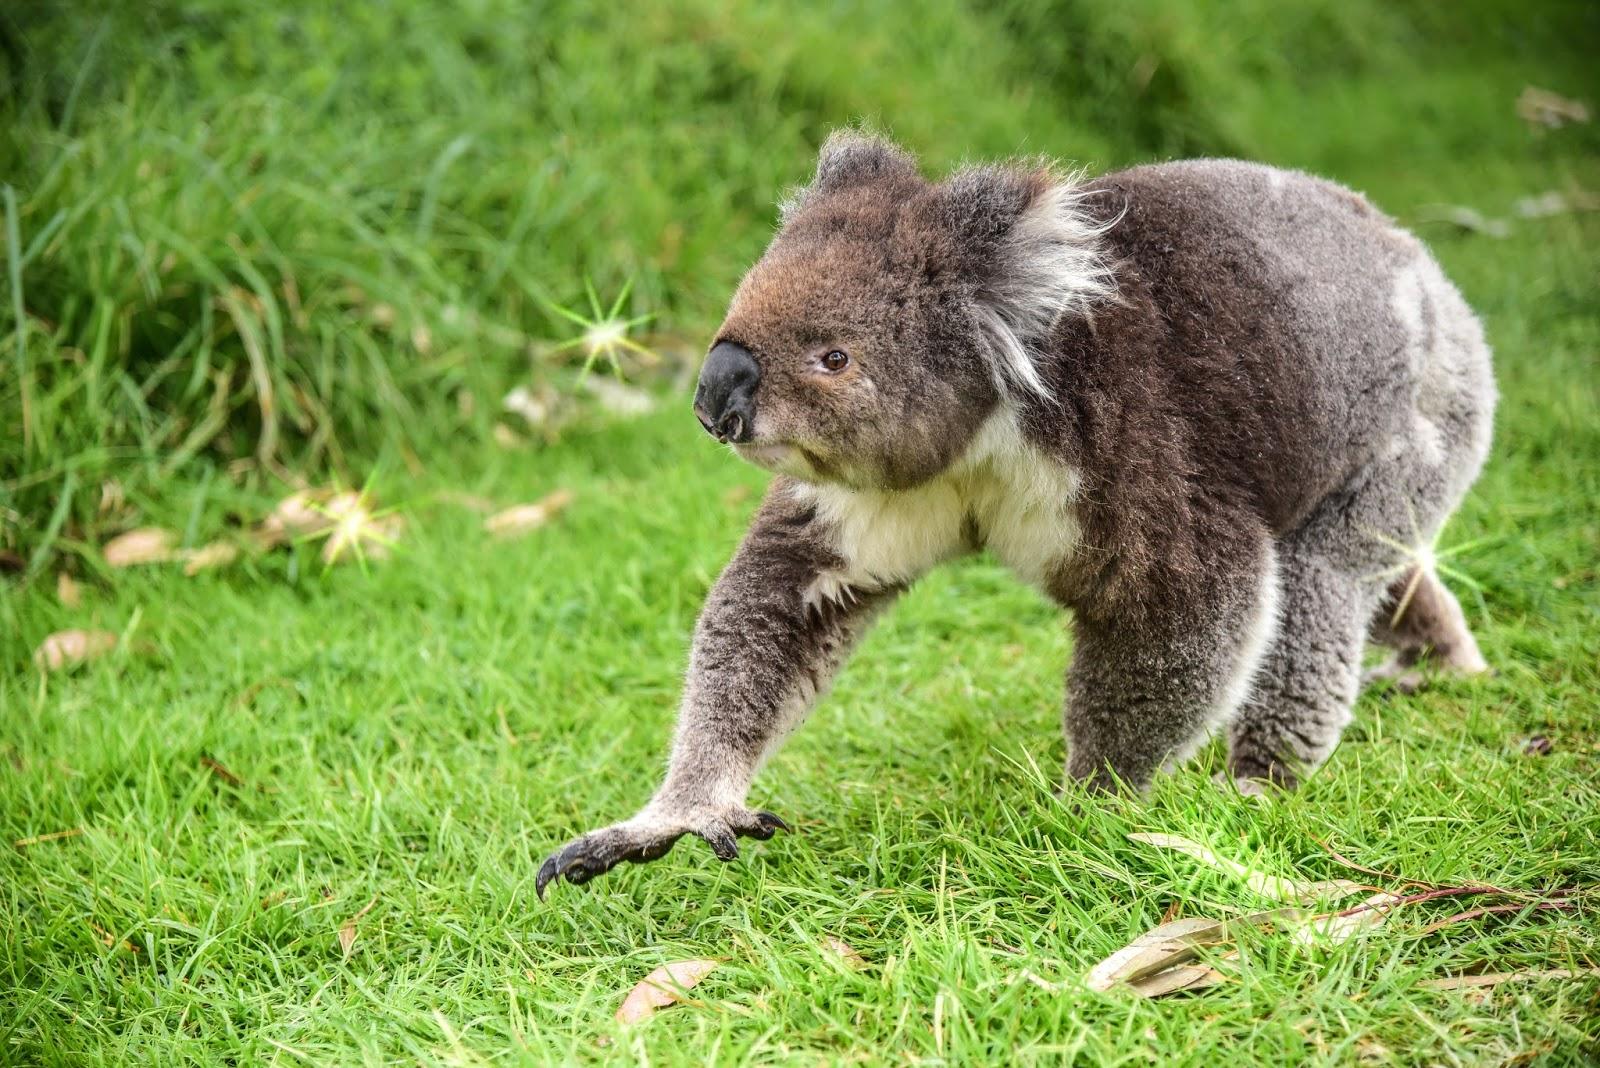 Koala walking on the grass.